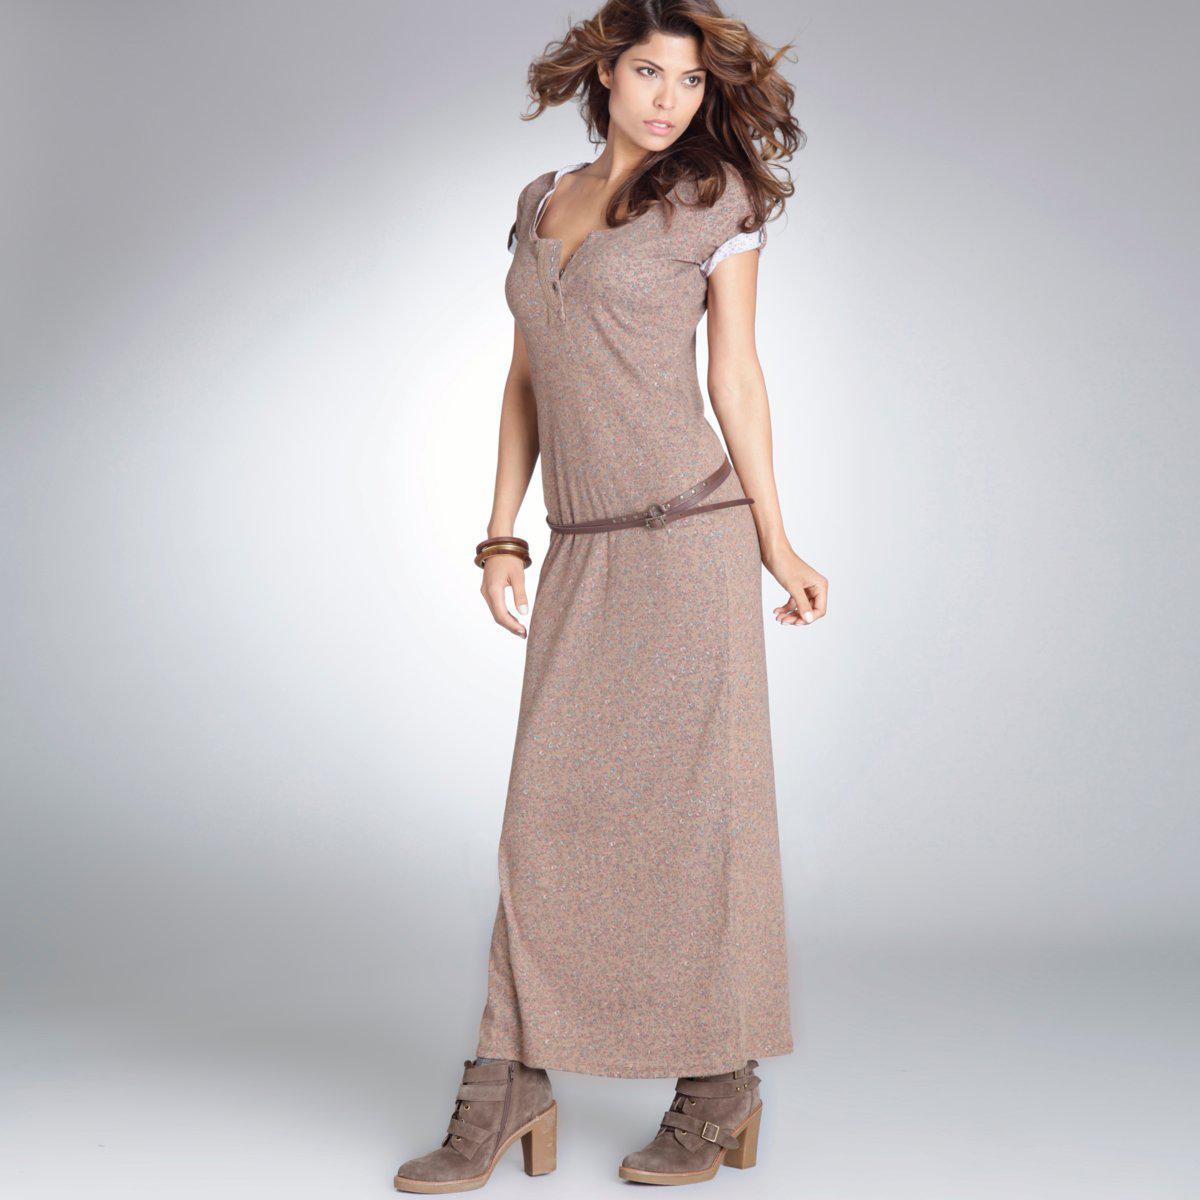 bradyna foremata 253 - Βραδυνα Φορεματα LaRedoute Φθινόπωρο 2011 Κωδ. 324209928